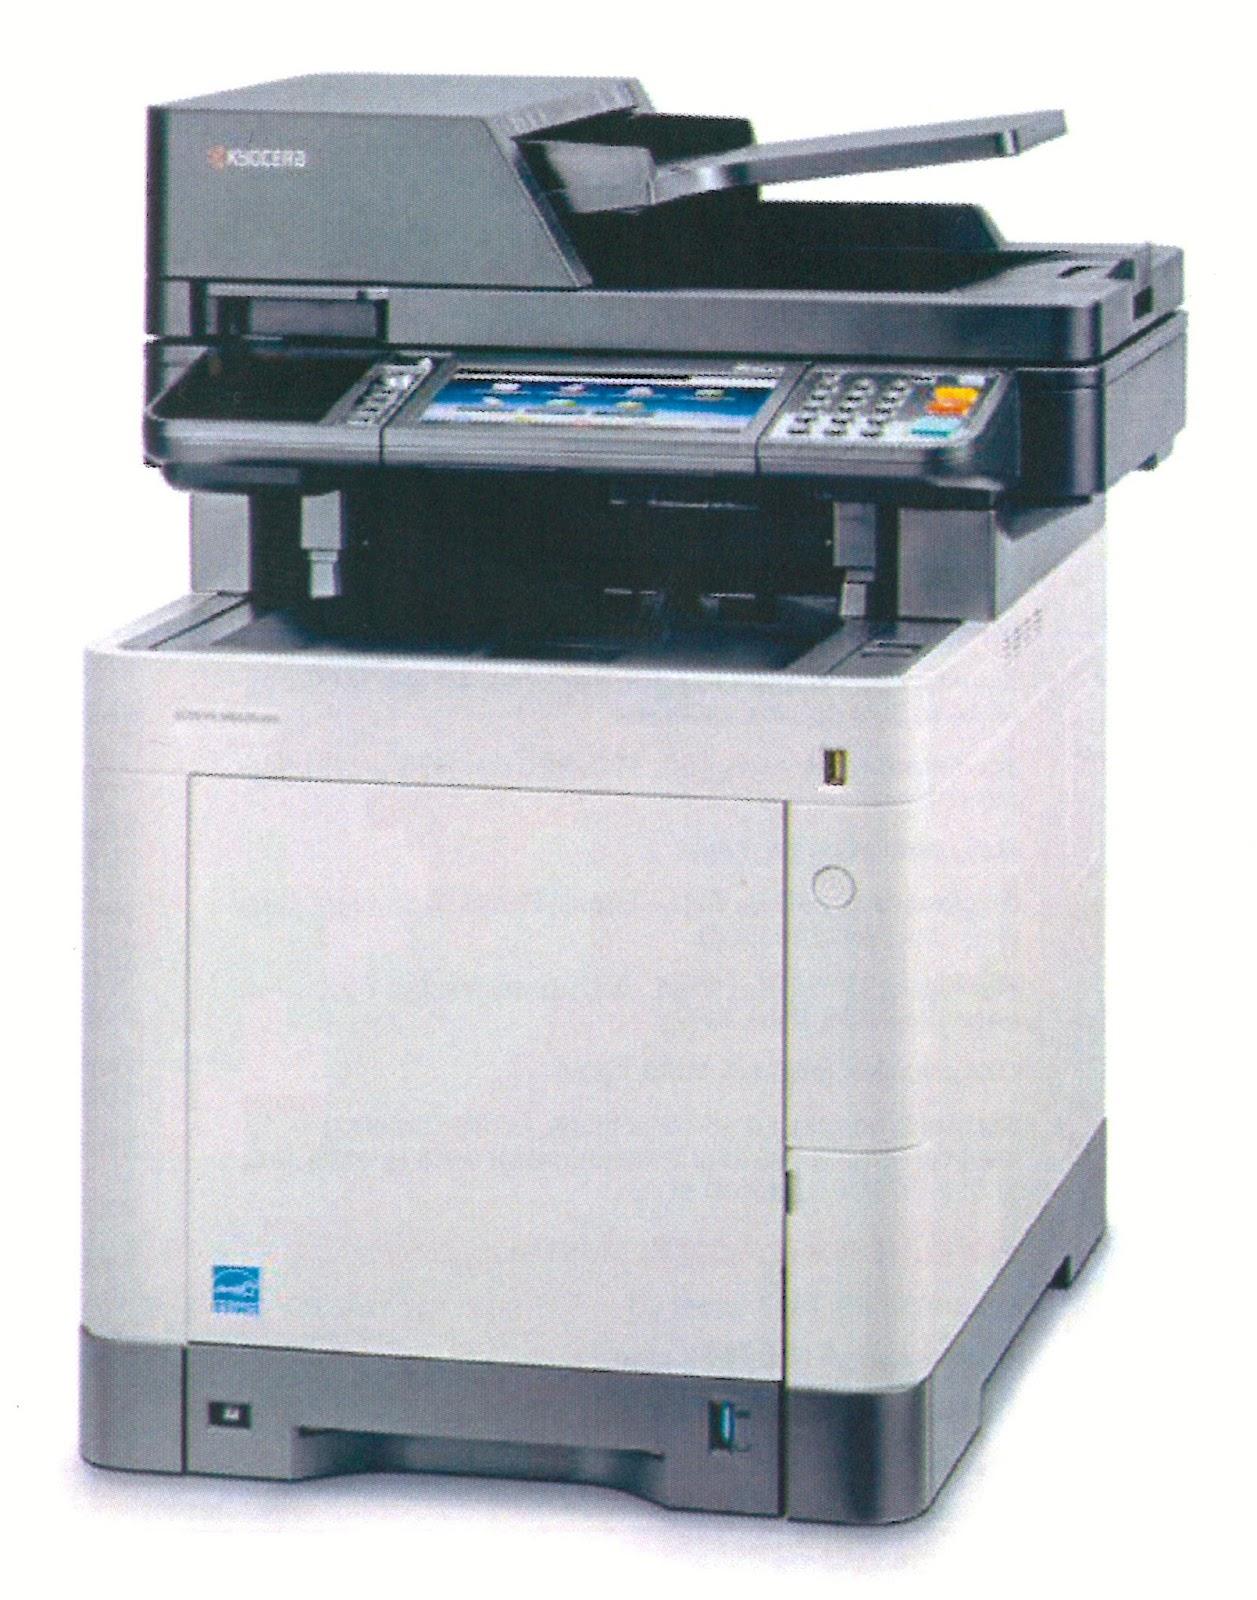 mesin fotocopy murah di surabaya